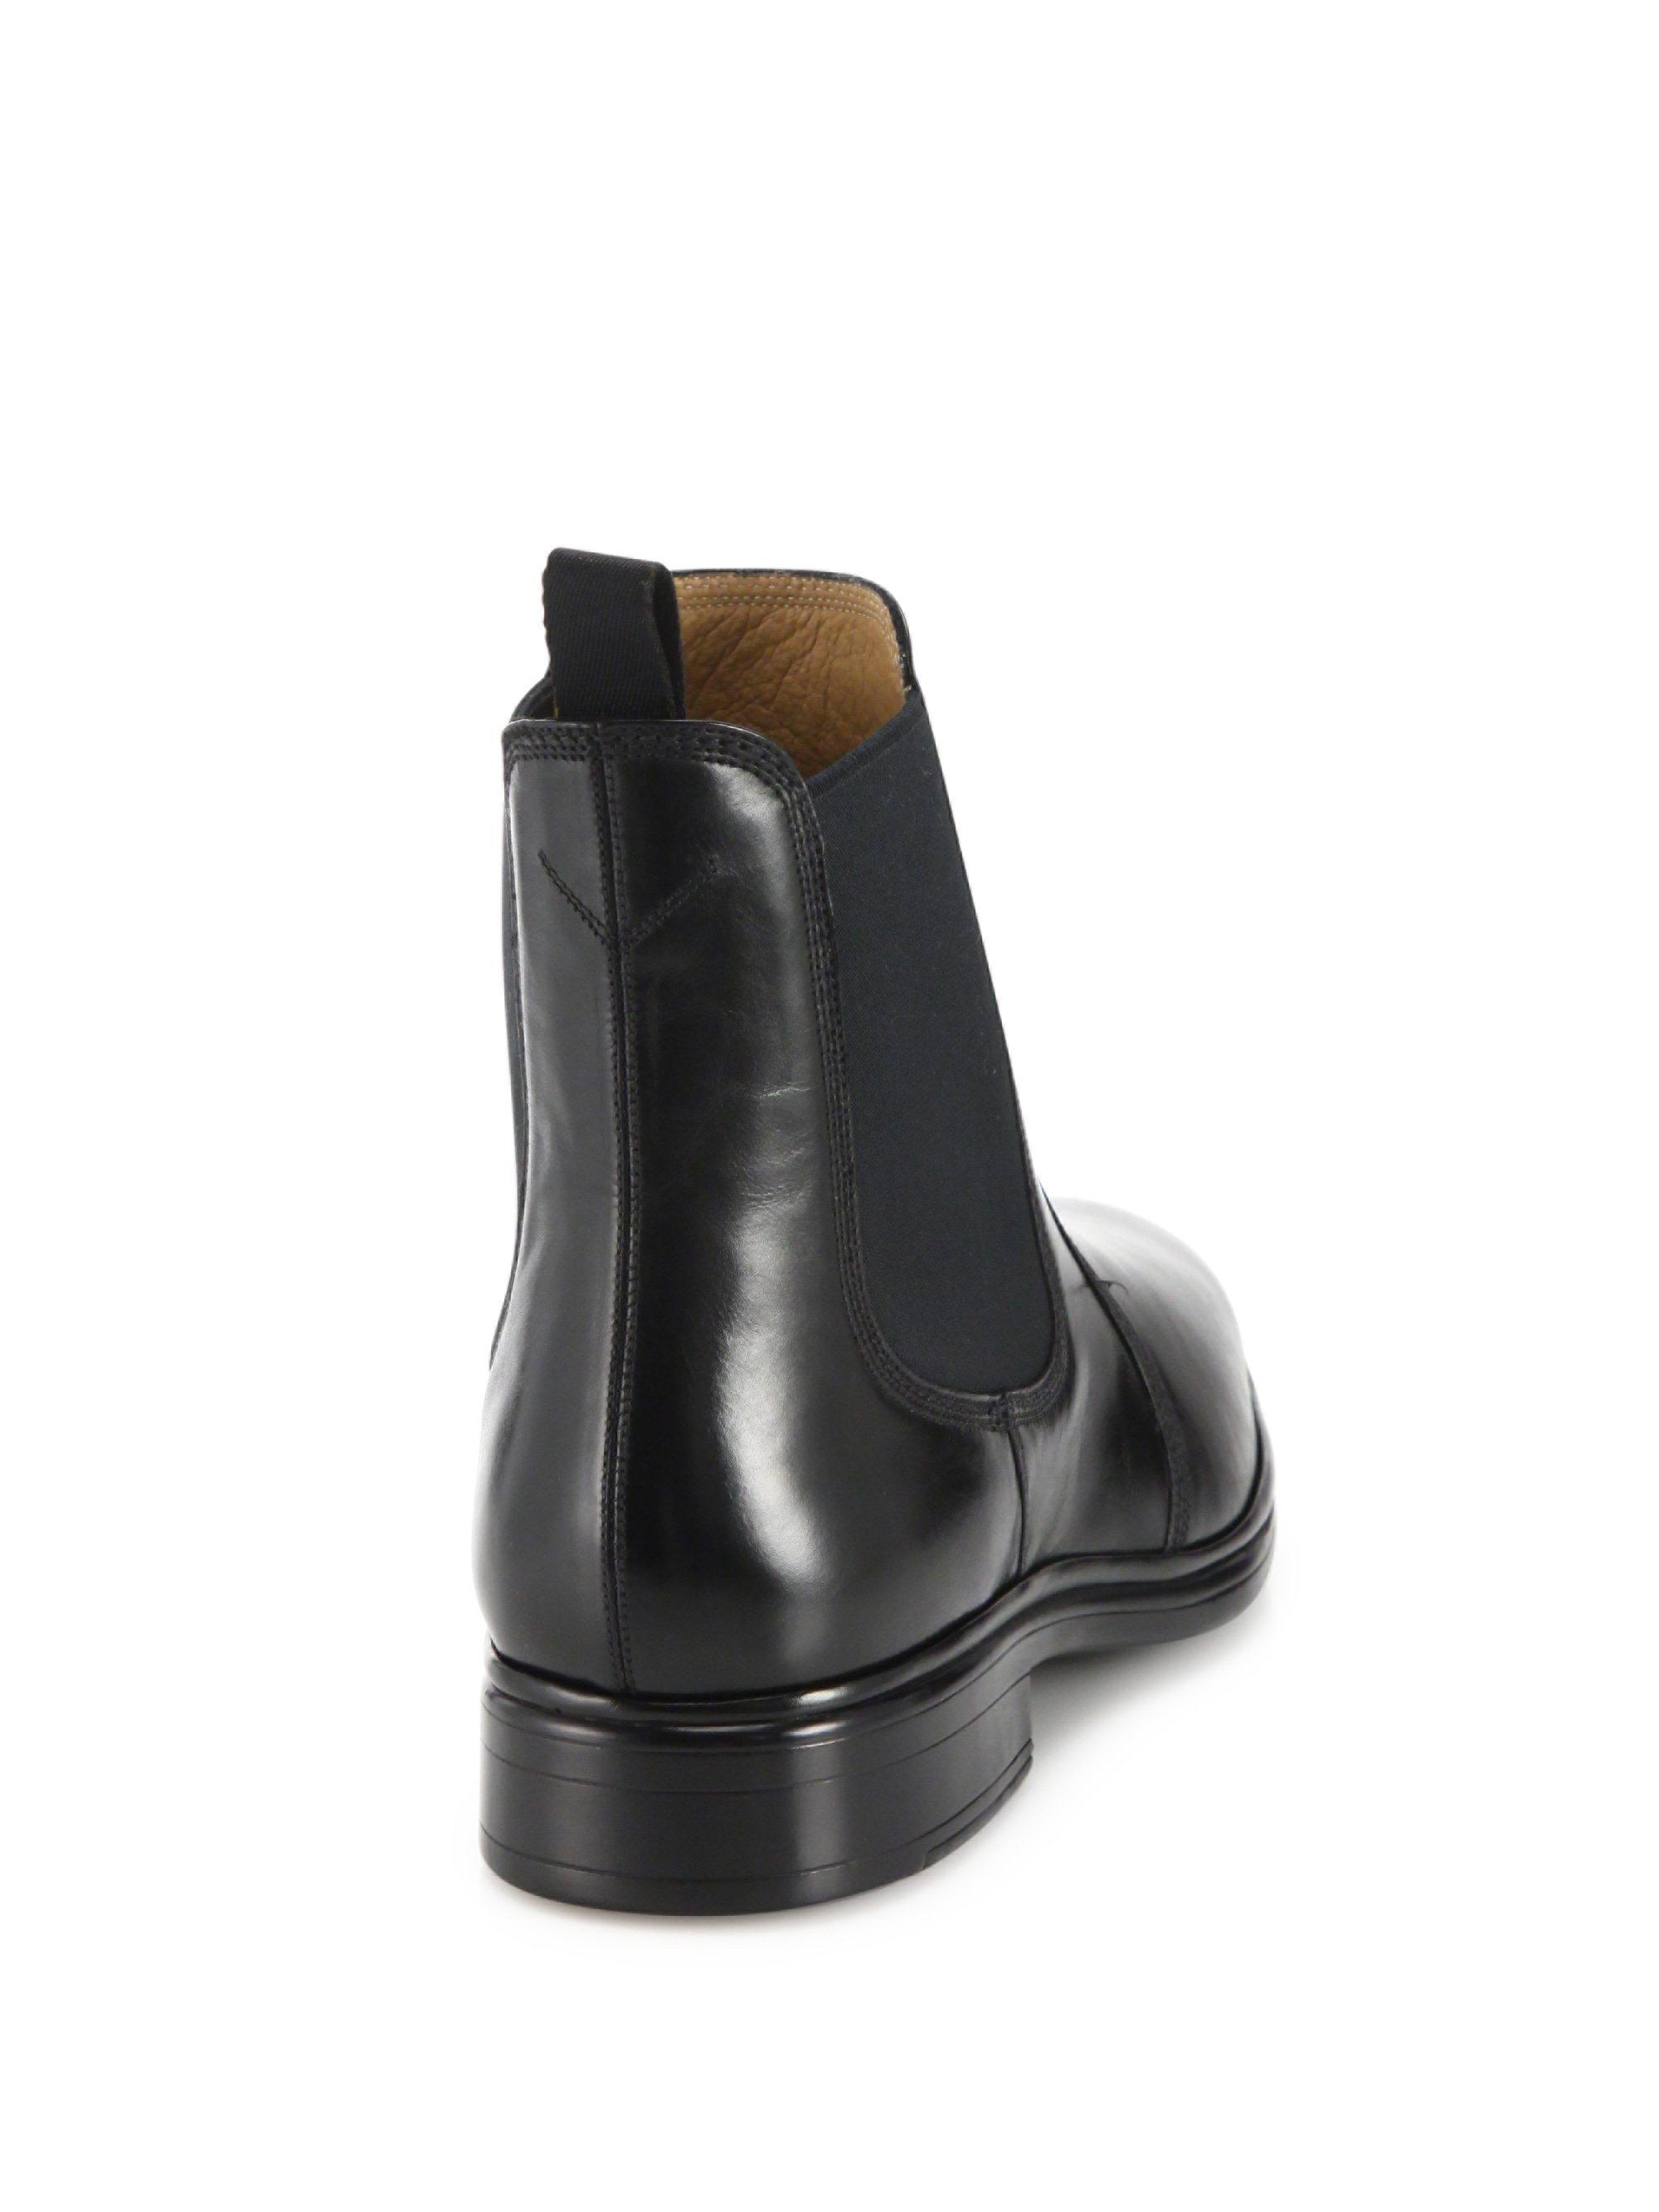 38ee61ebdfa Lyst - Bally Nendor in Black for Men